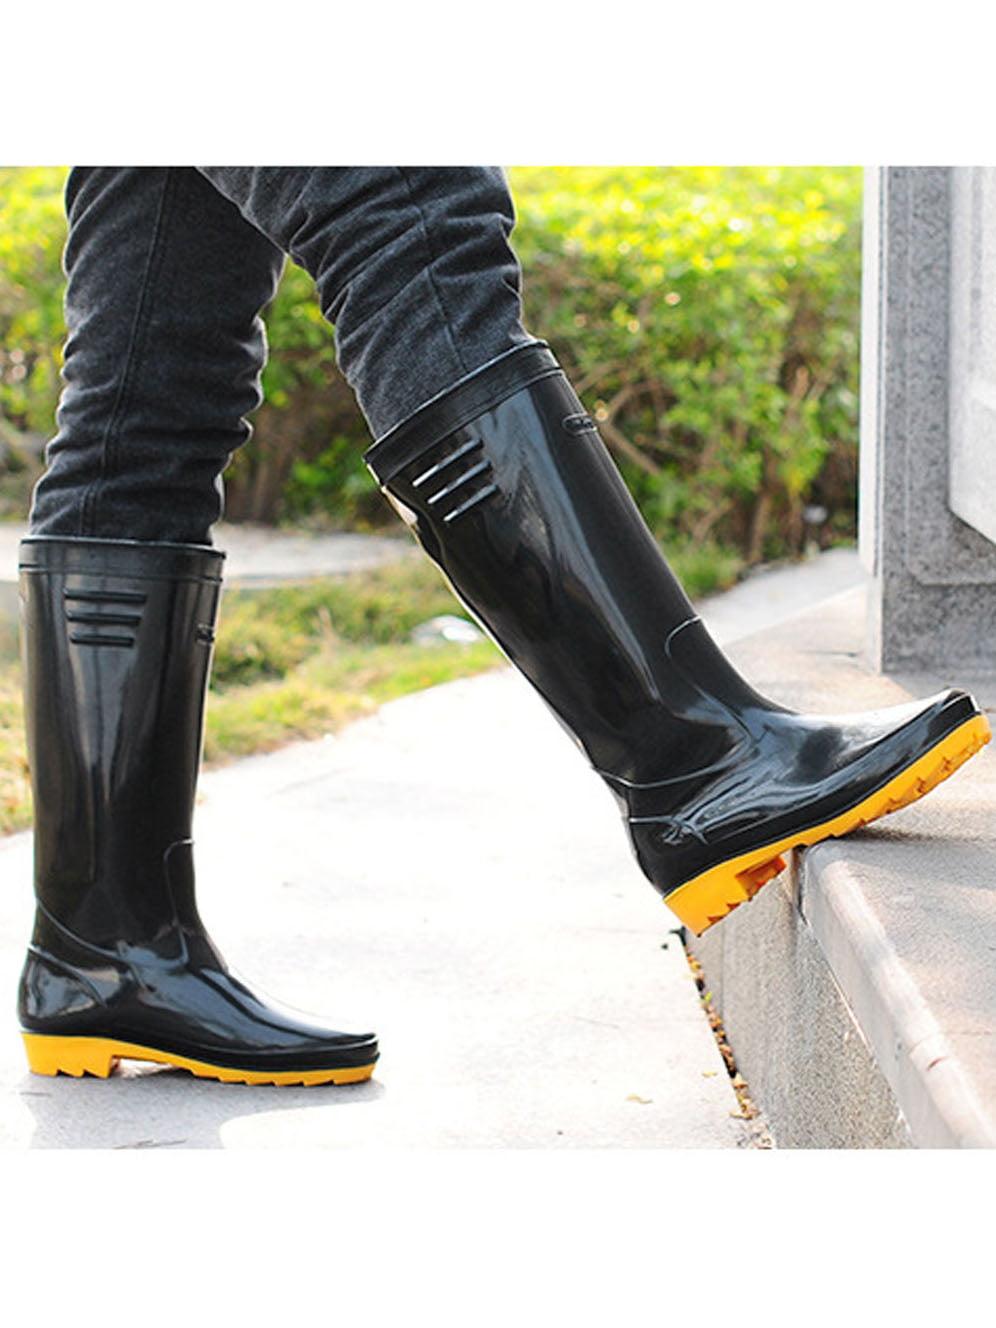 buy \u003e men's fashion rain boots, Up to